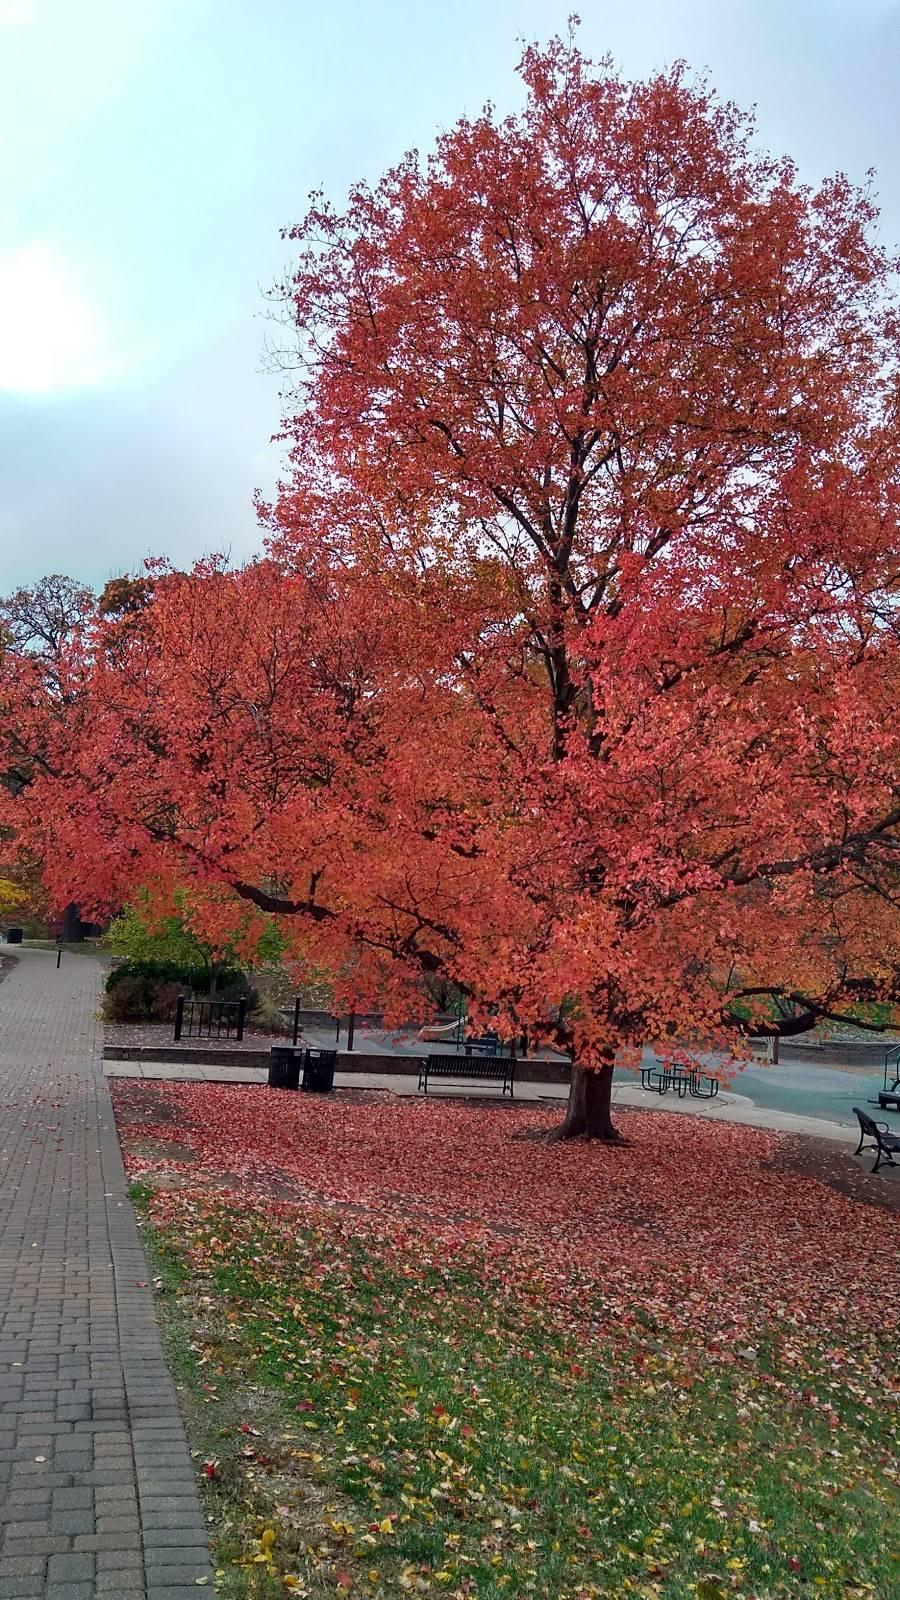 Blackburn Park - park  | Photo 6 of 10 | Address: Edgar Rd, Webster Groves, MO 63119, USA | Phone: (314) 963-5600